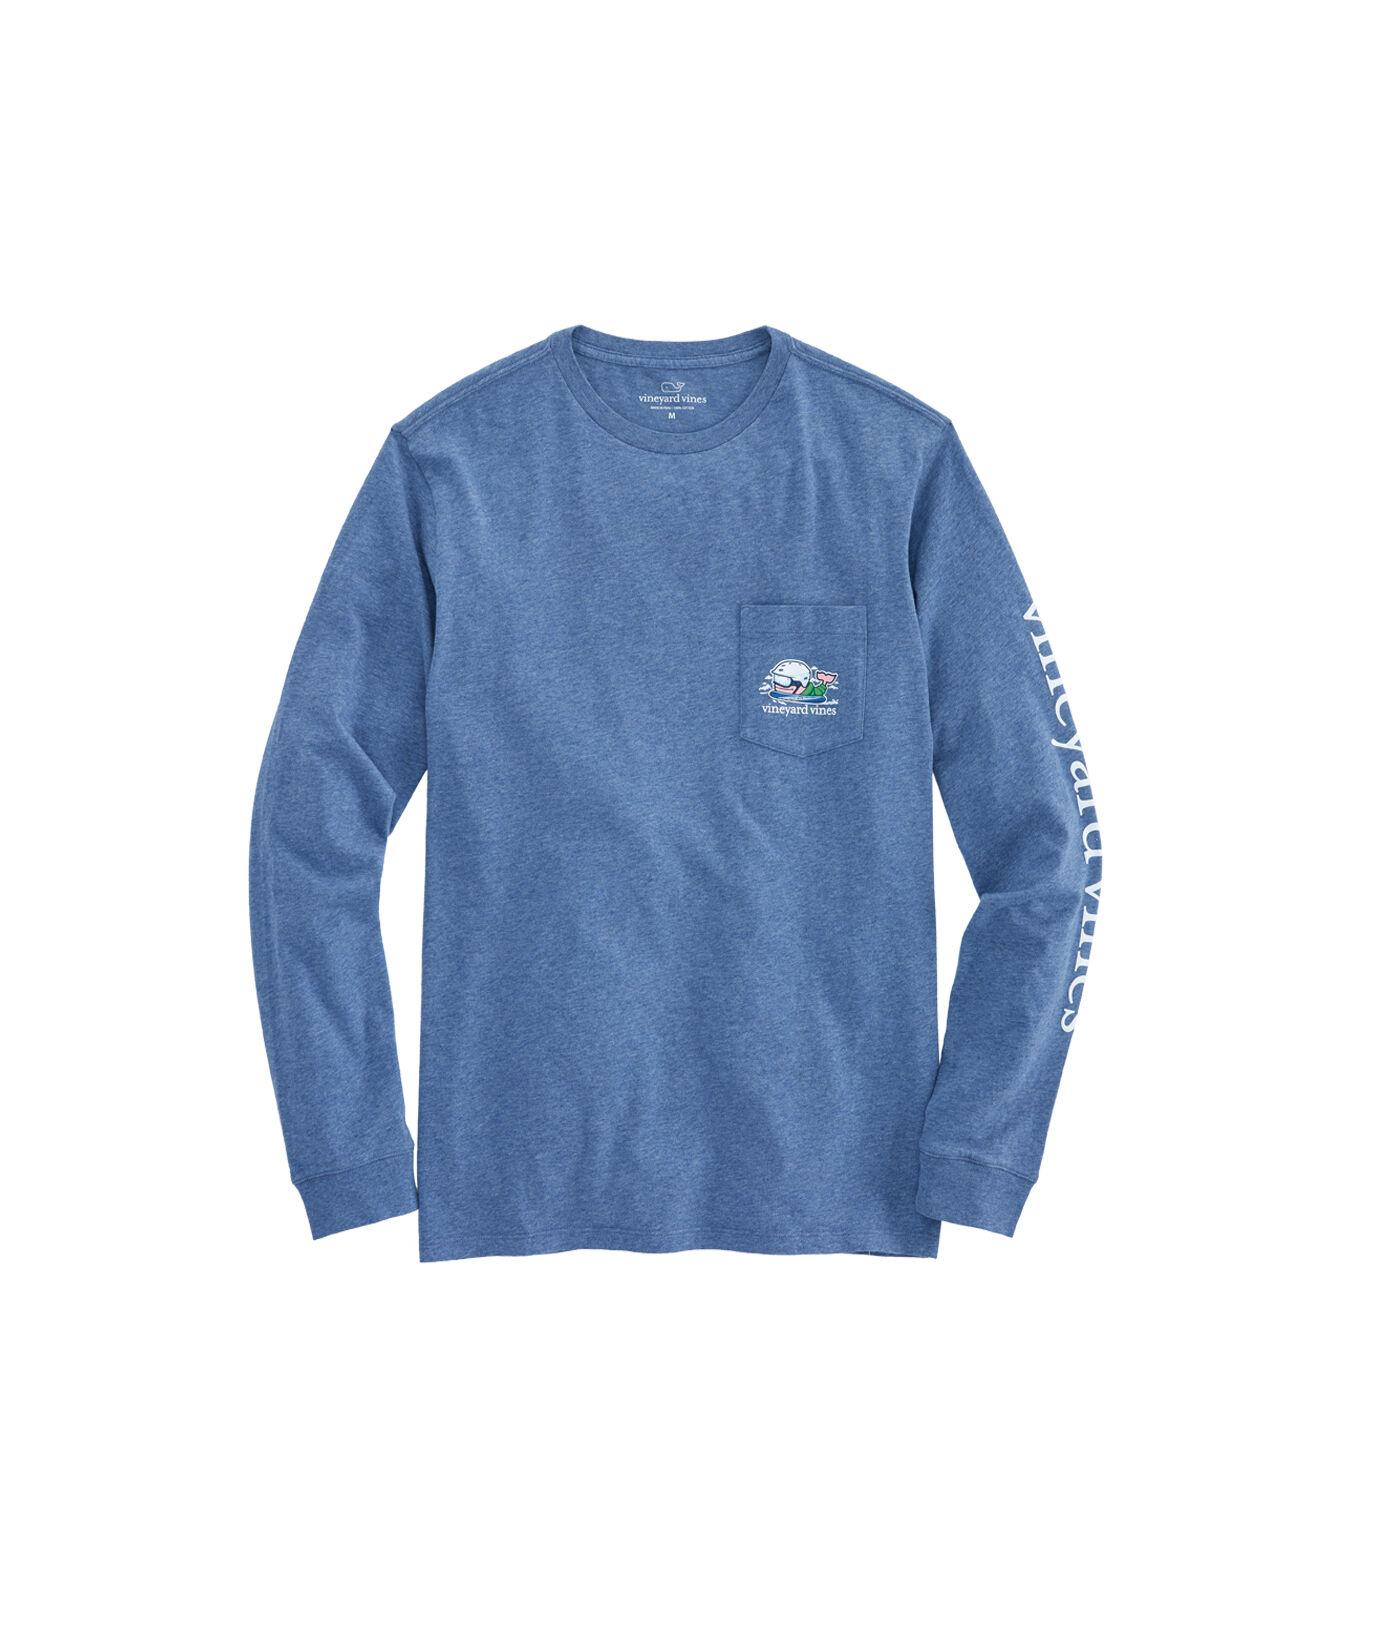 Vineyard Vines Men/'s Skyfall Blue Vintage Whale Graphic Pocket Long Sleeve Shirt